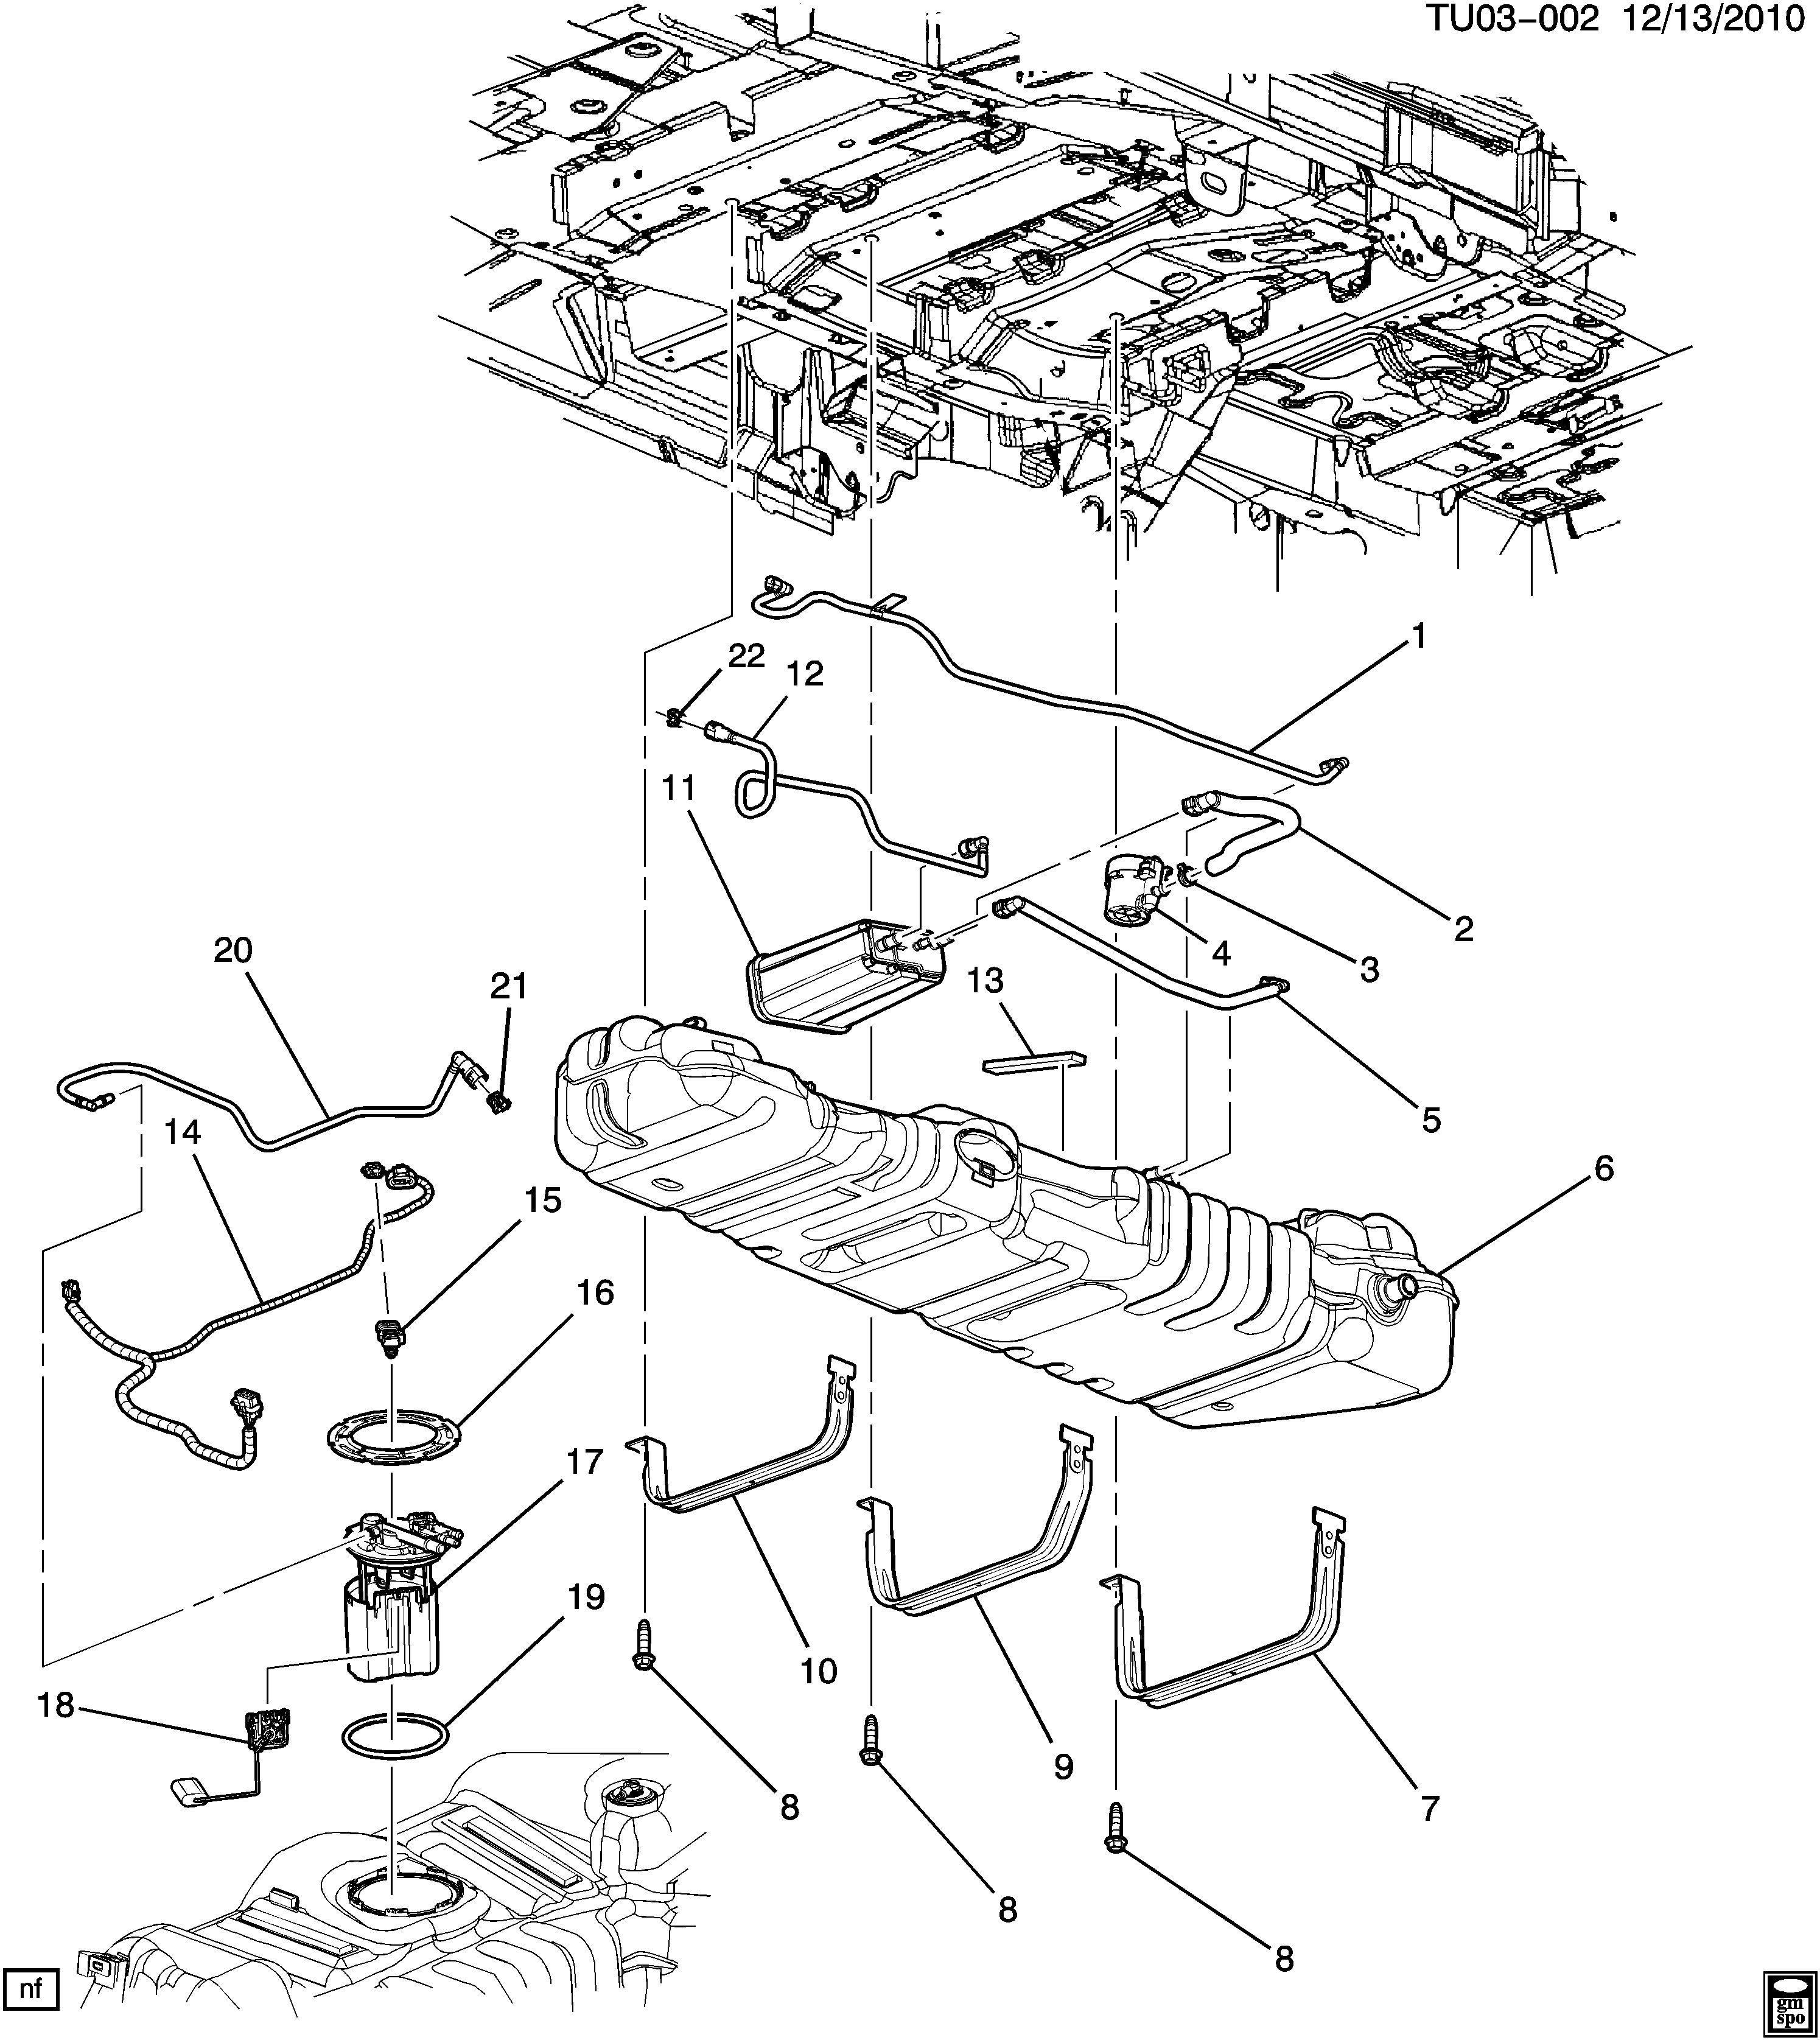 Chevrolet UPLANDER FUEL TANK & MOUNTING